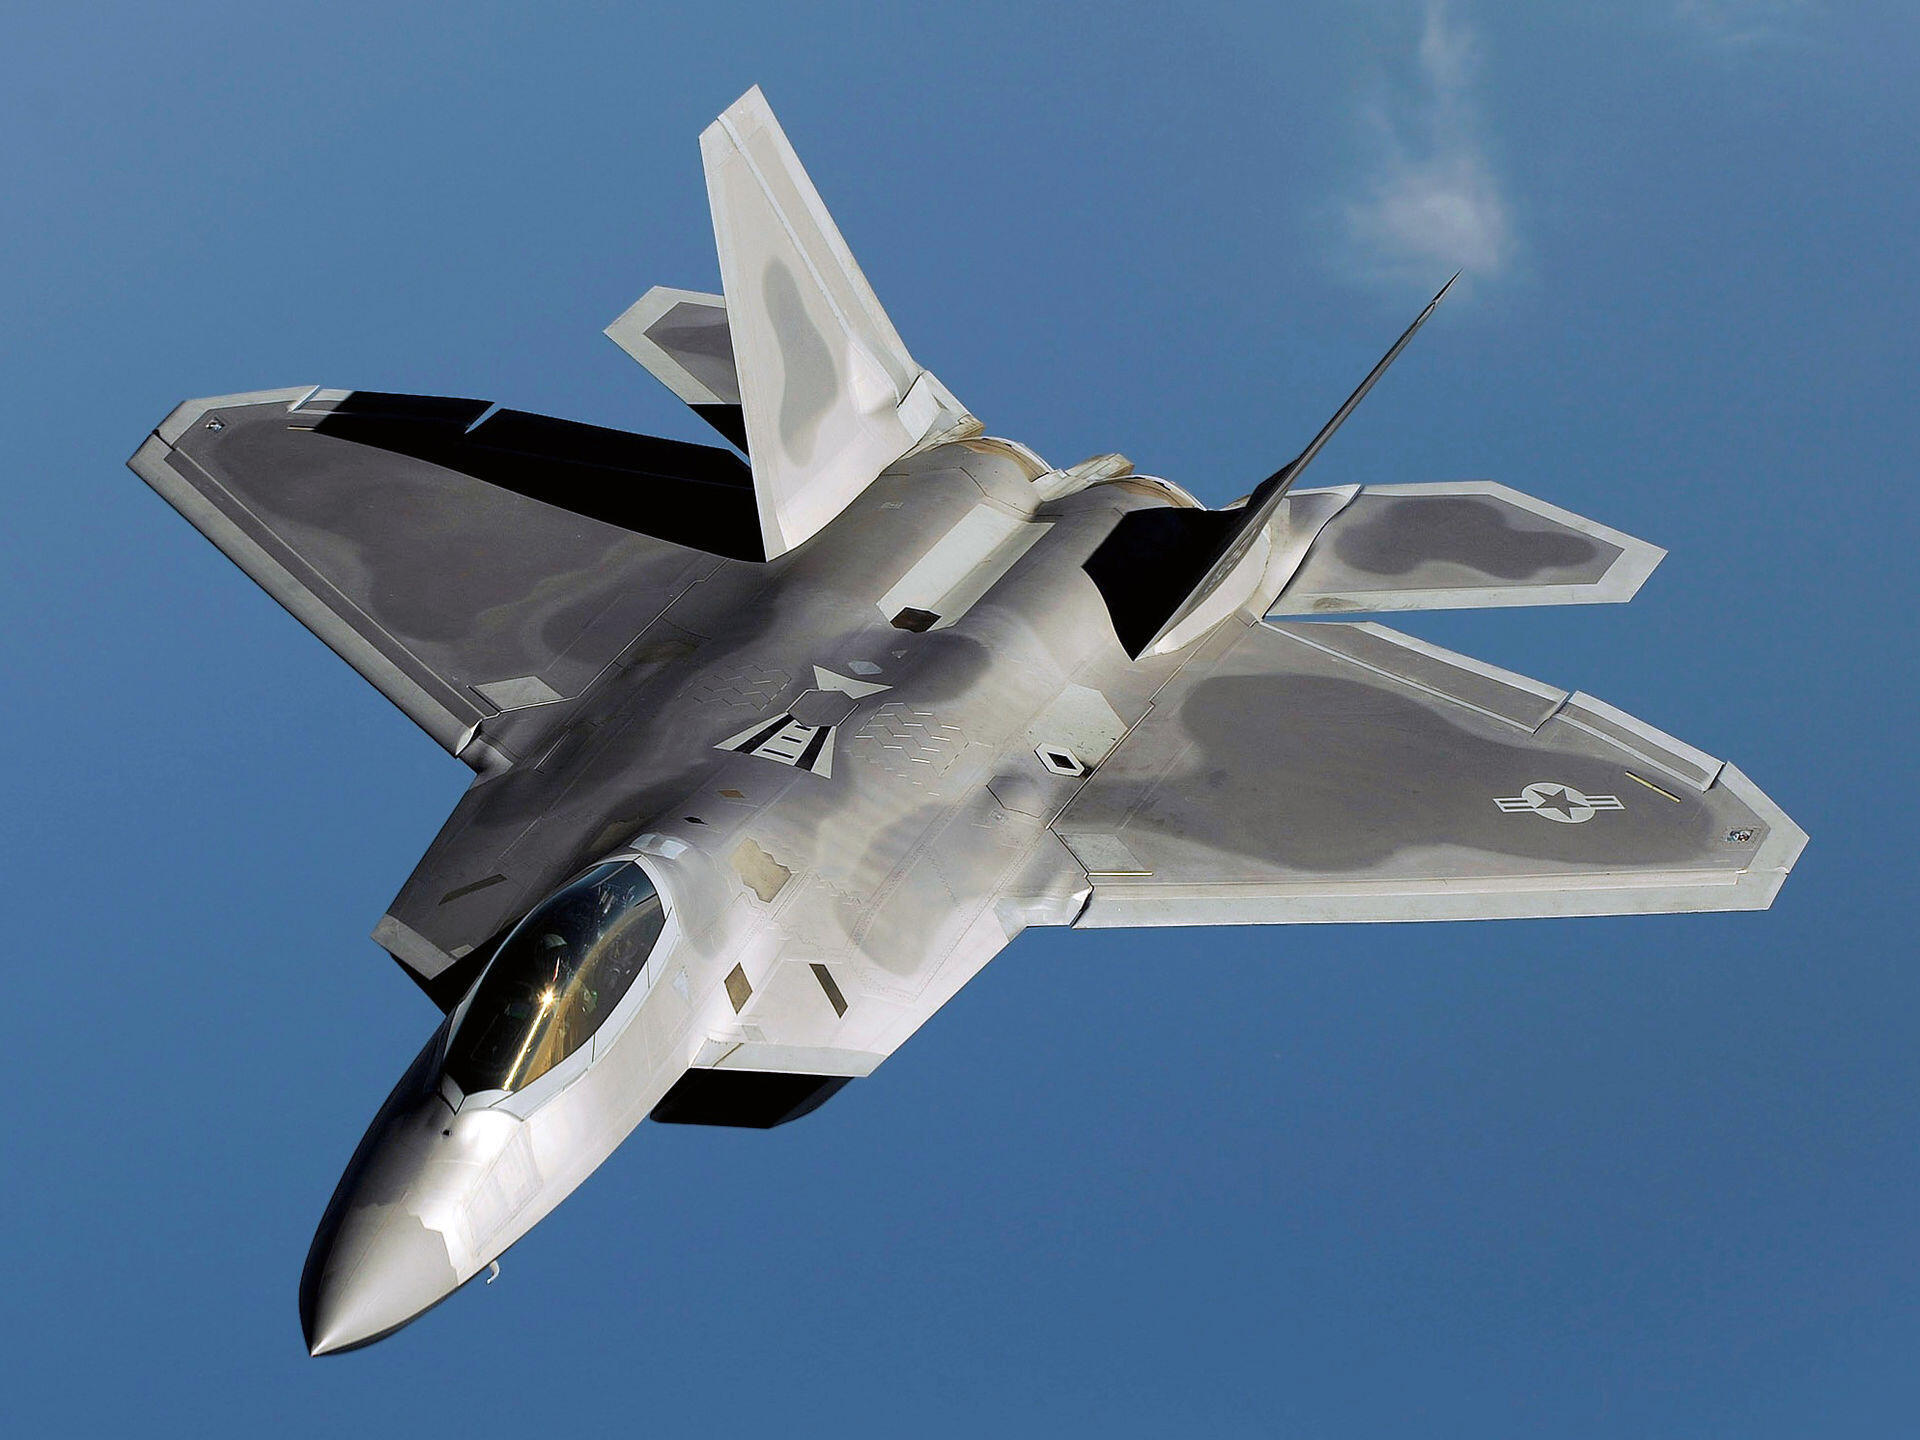 Chiến đấu cơ Lockheed Martin F-22 Raptor (ảnh wikipedia.org)